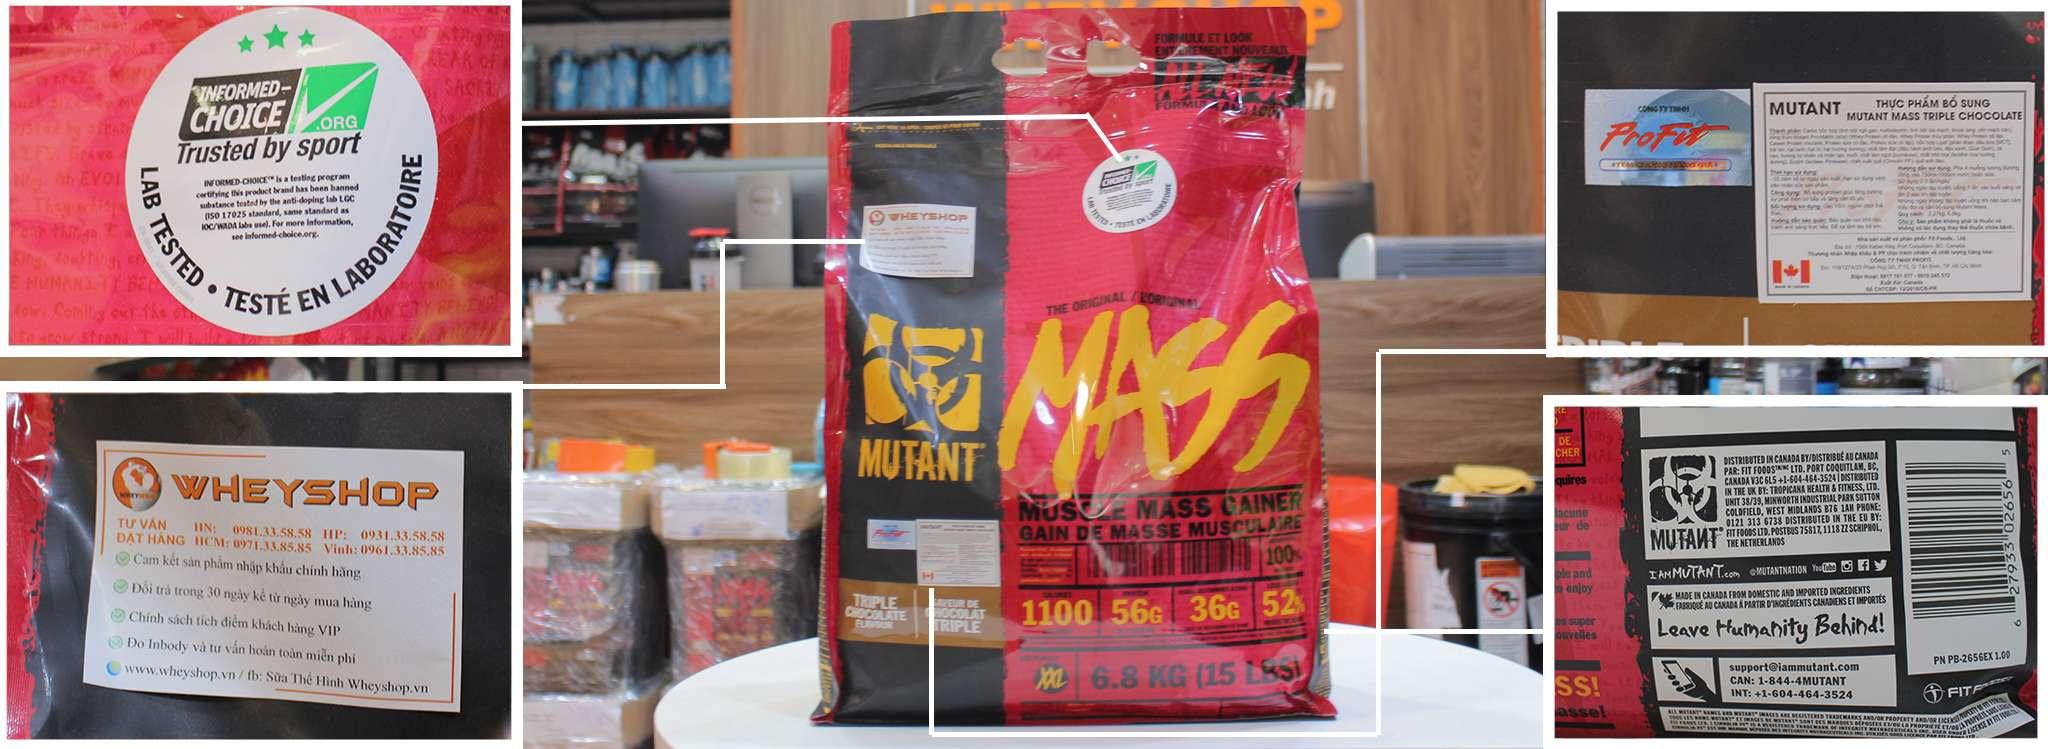 mutant mass 6,8kg gia re ha noi tphcm